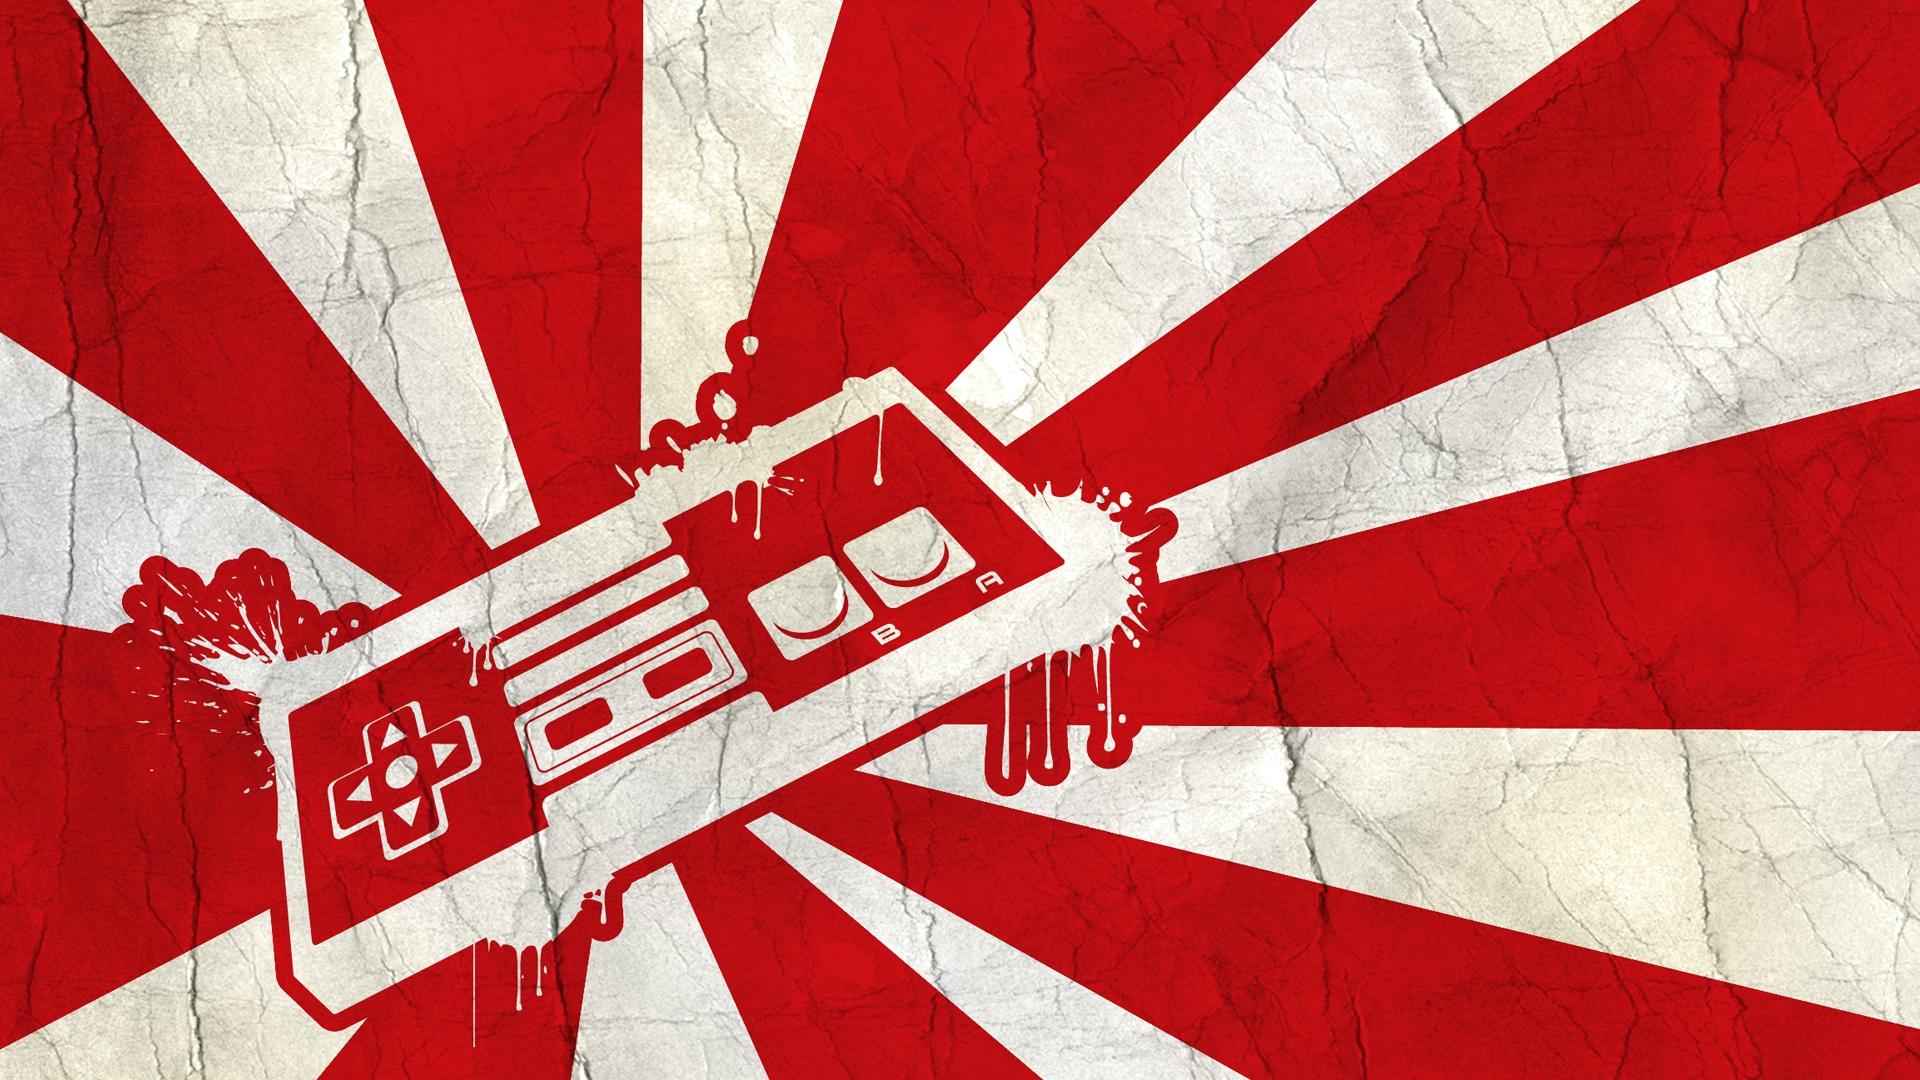 Nintendo HD Wallpaper